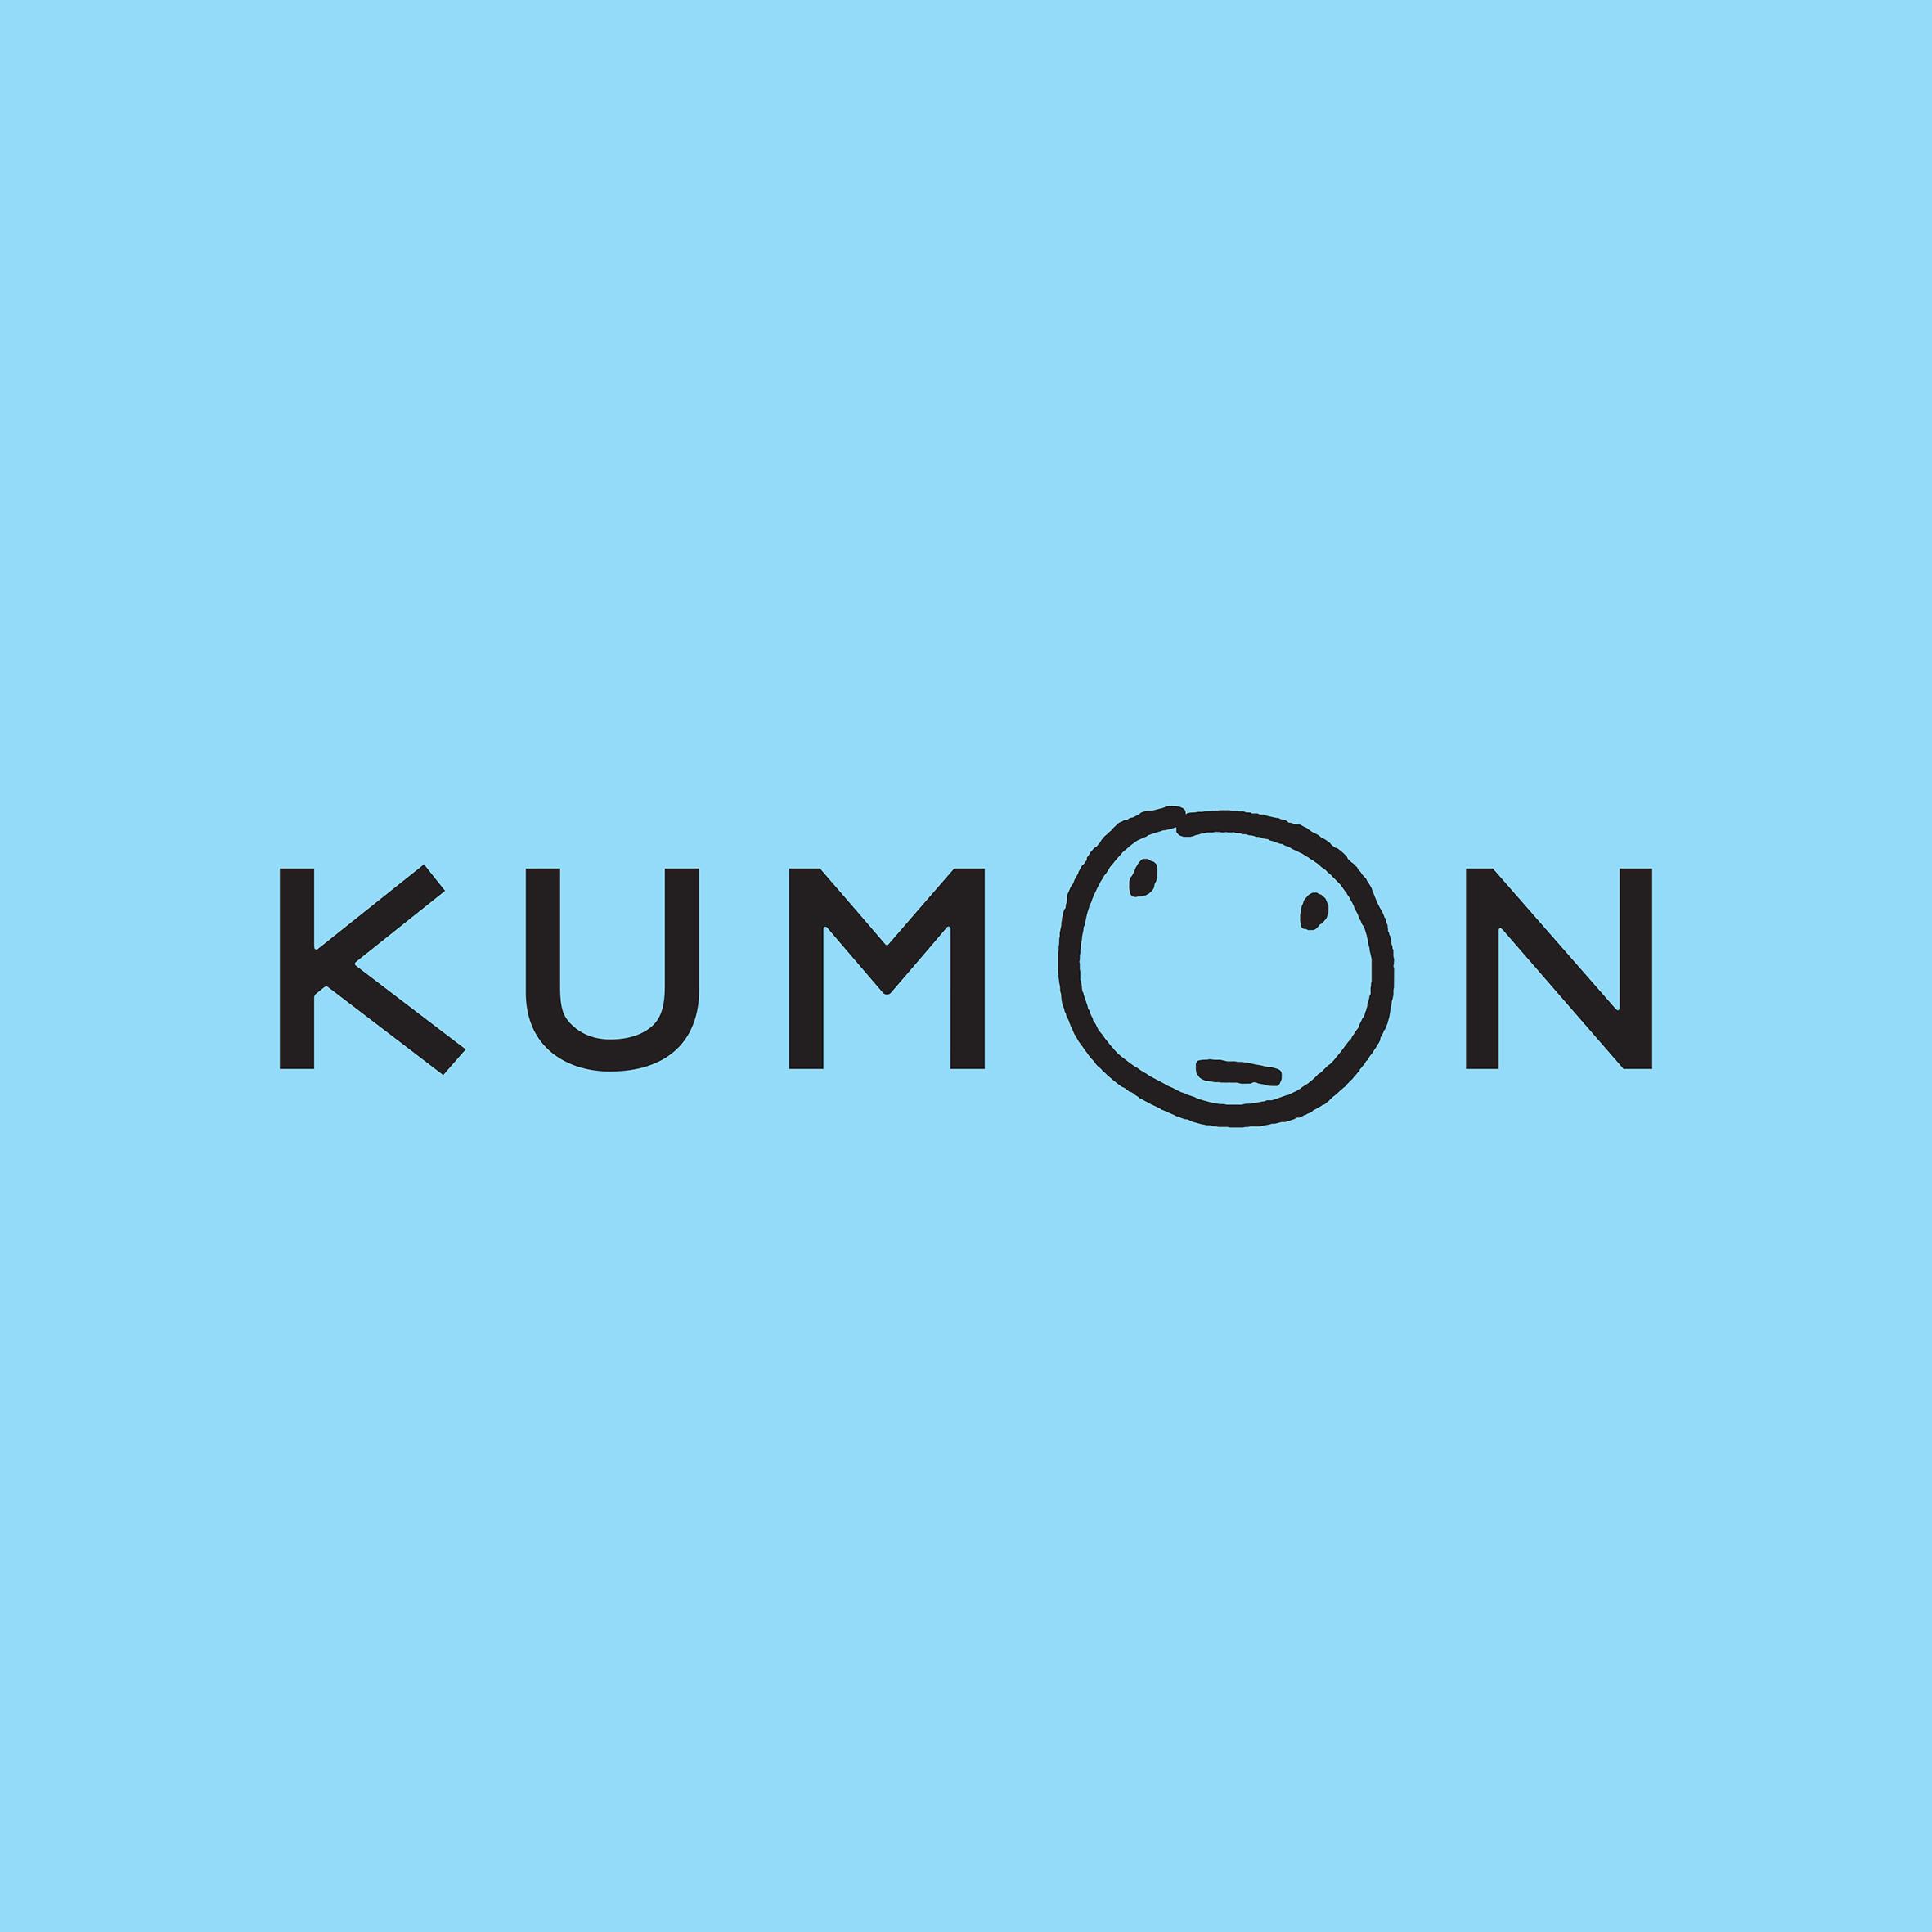 Kumon - Maths & English Classes for Children